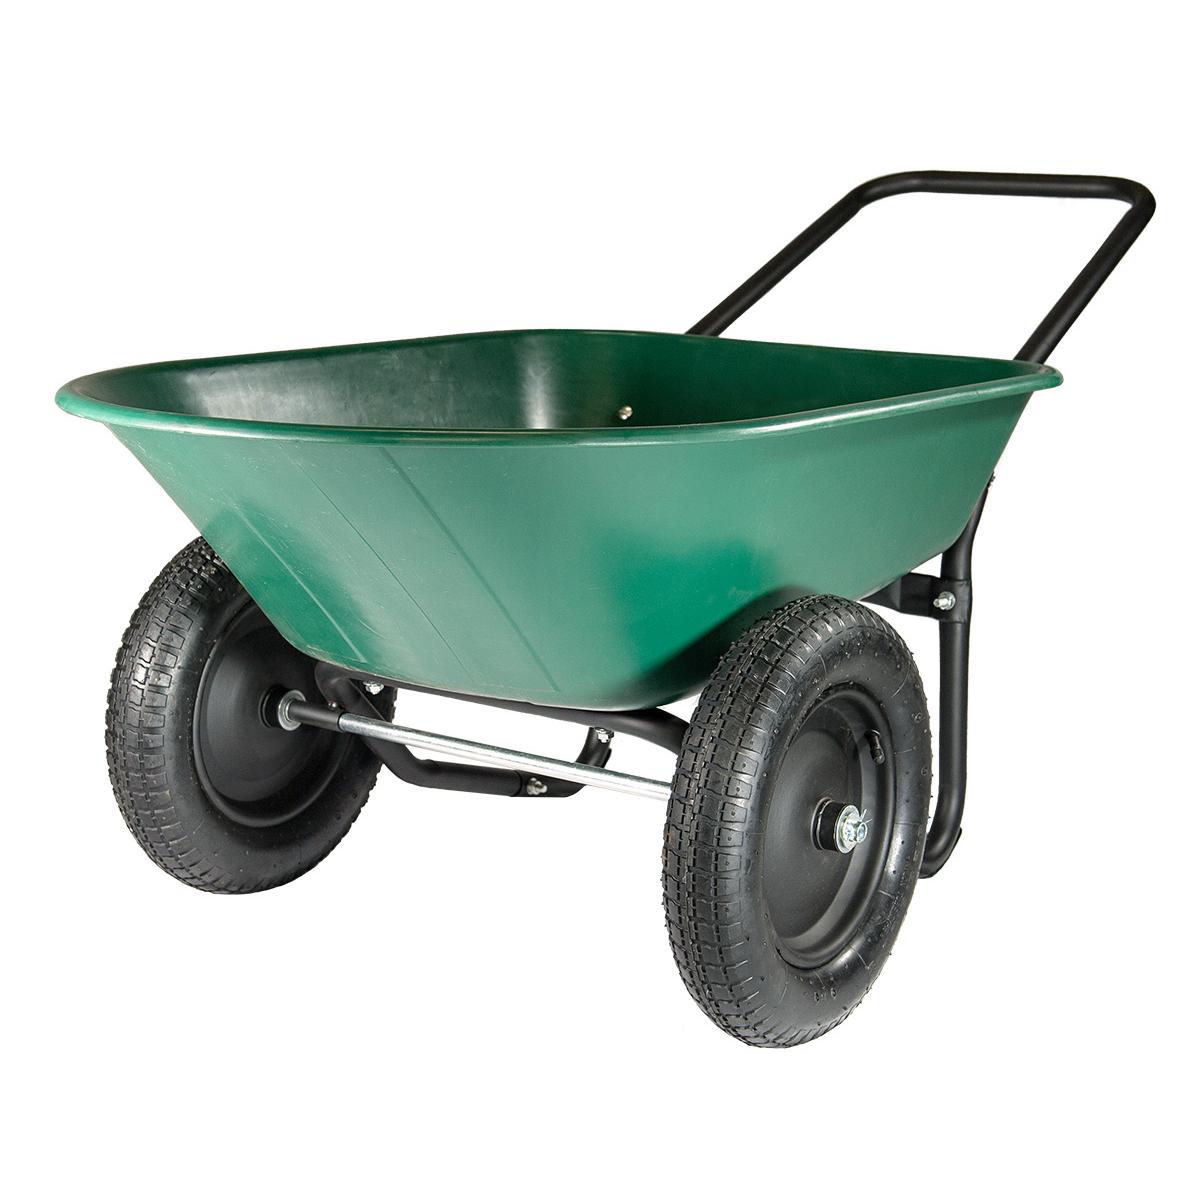 Marathon 70007 5 Cubic Ft Green/Black Poly Wheelbarrow Yard Rover